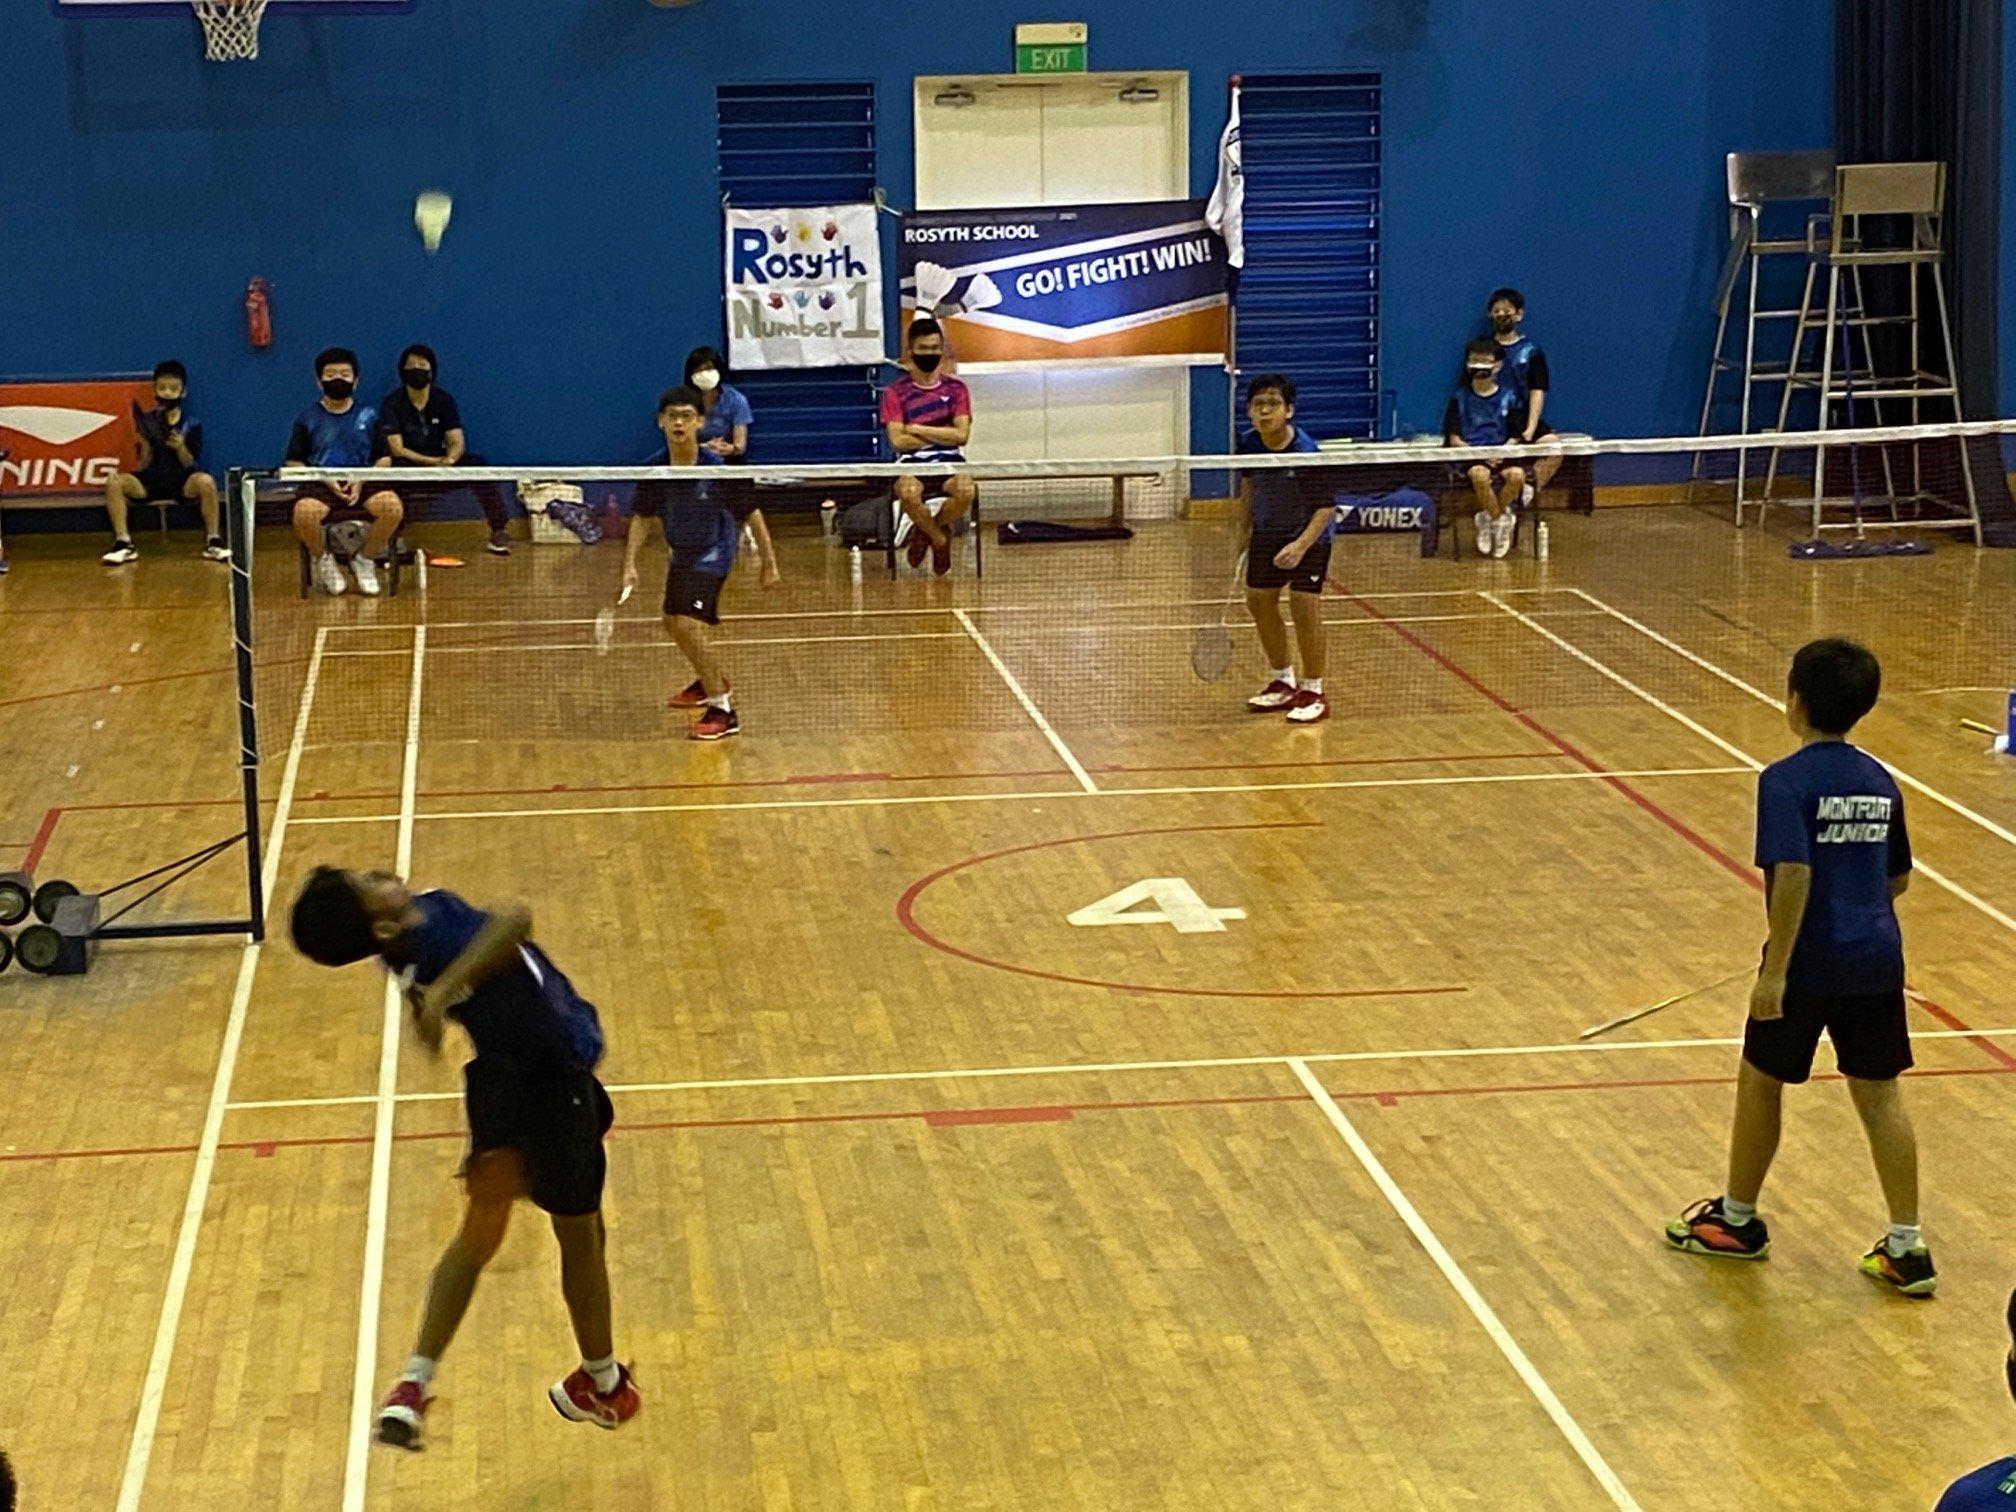 NSG Snr Div North Zone boys' badminton final - first doubles